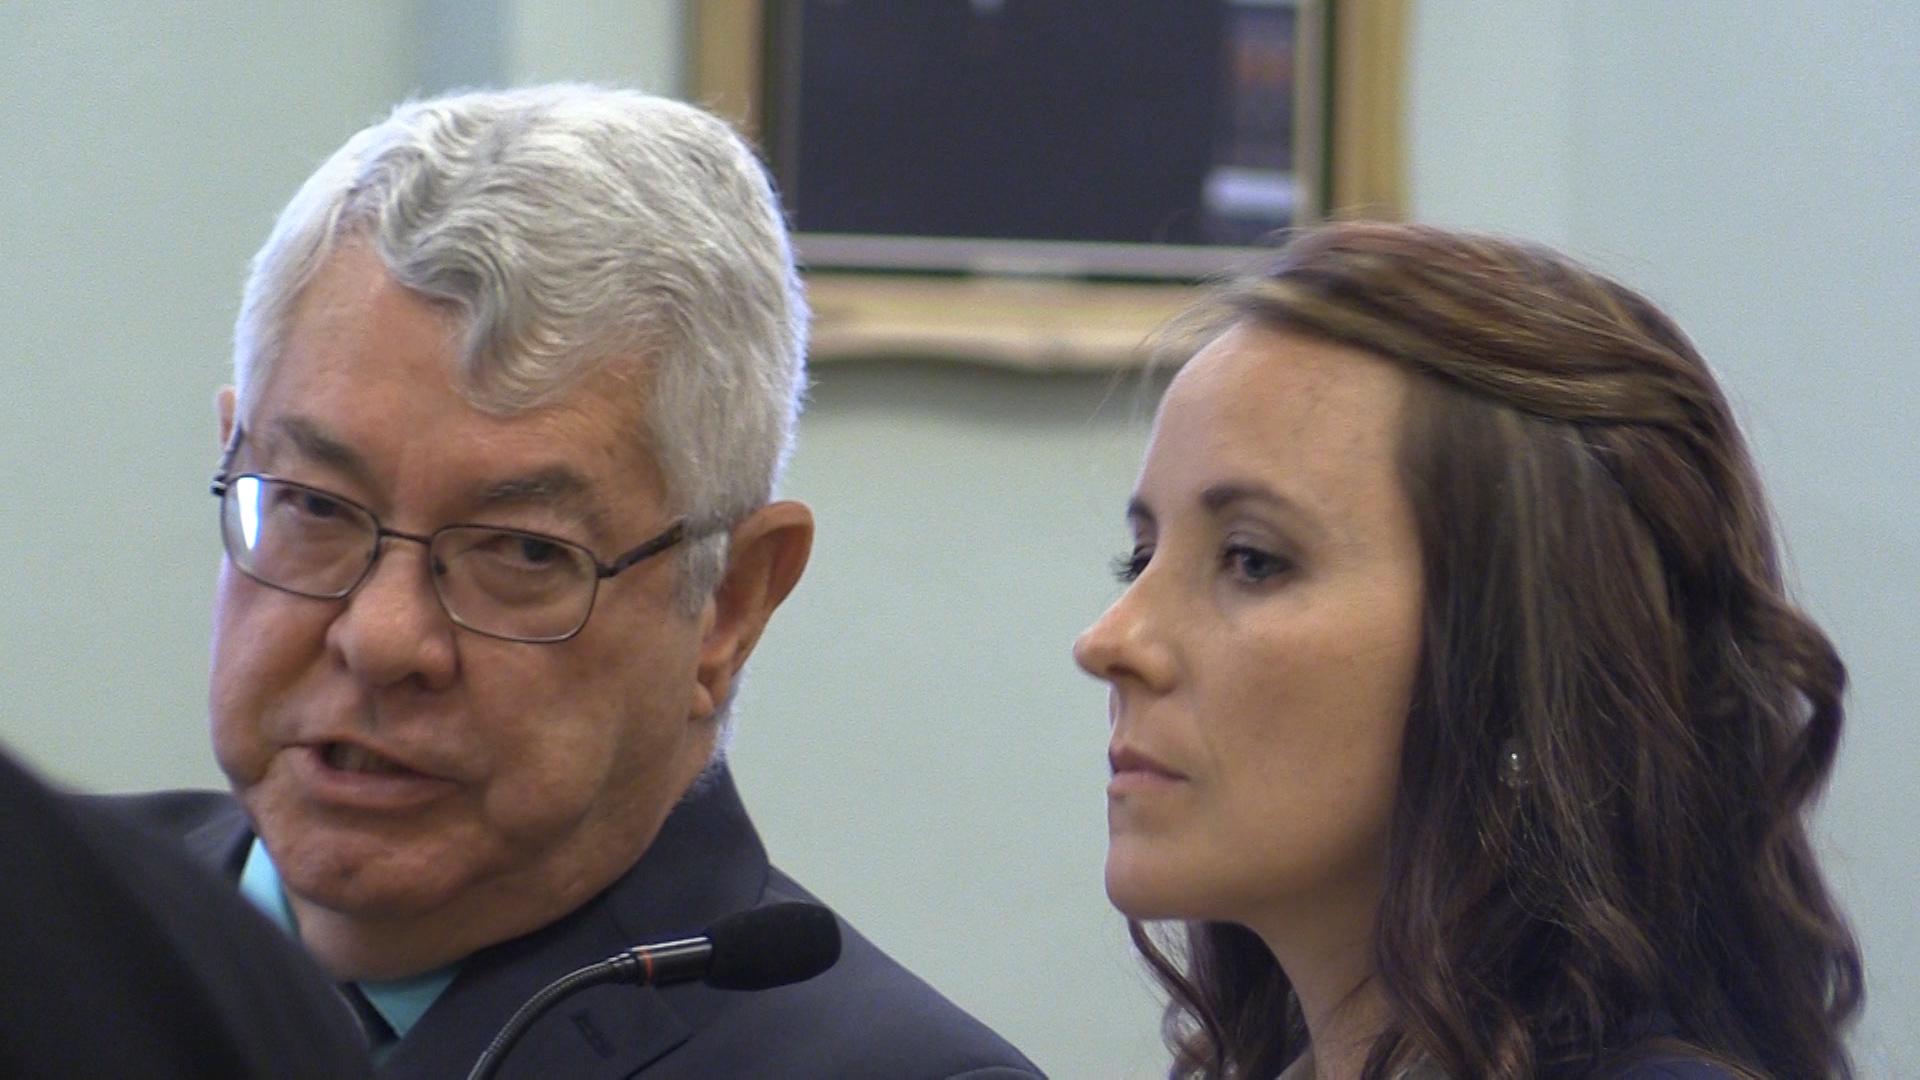 VIDEO: Brooke Hale enters no contest plea